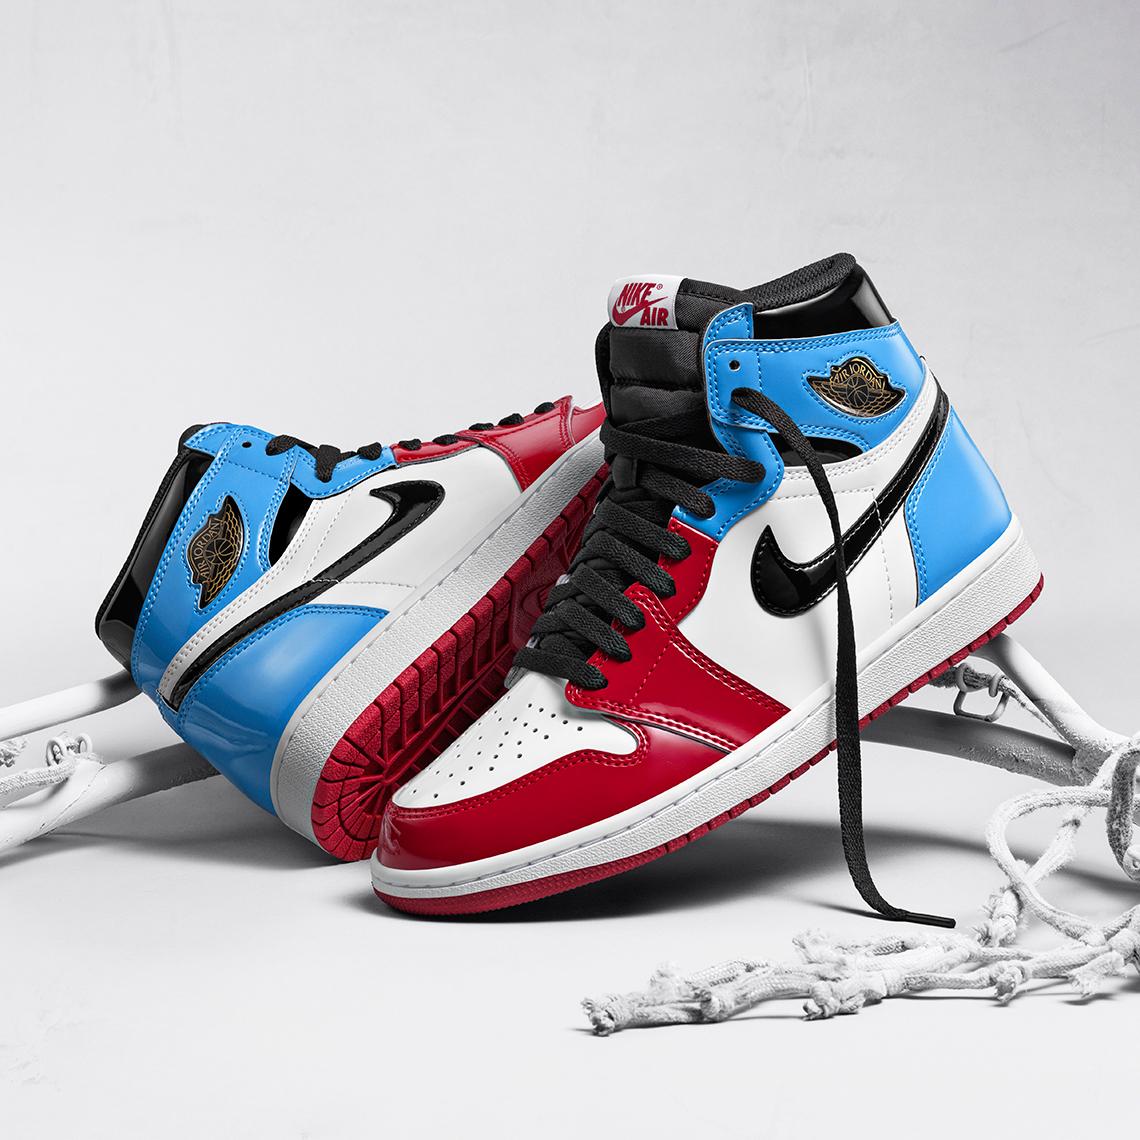 new jordan ones